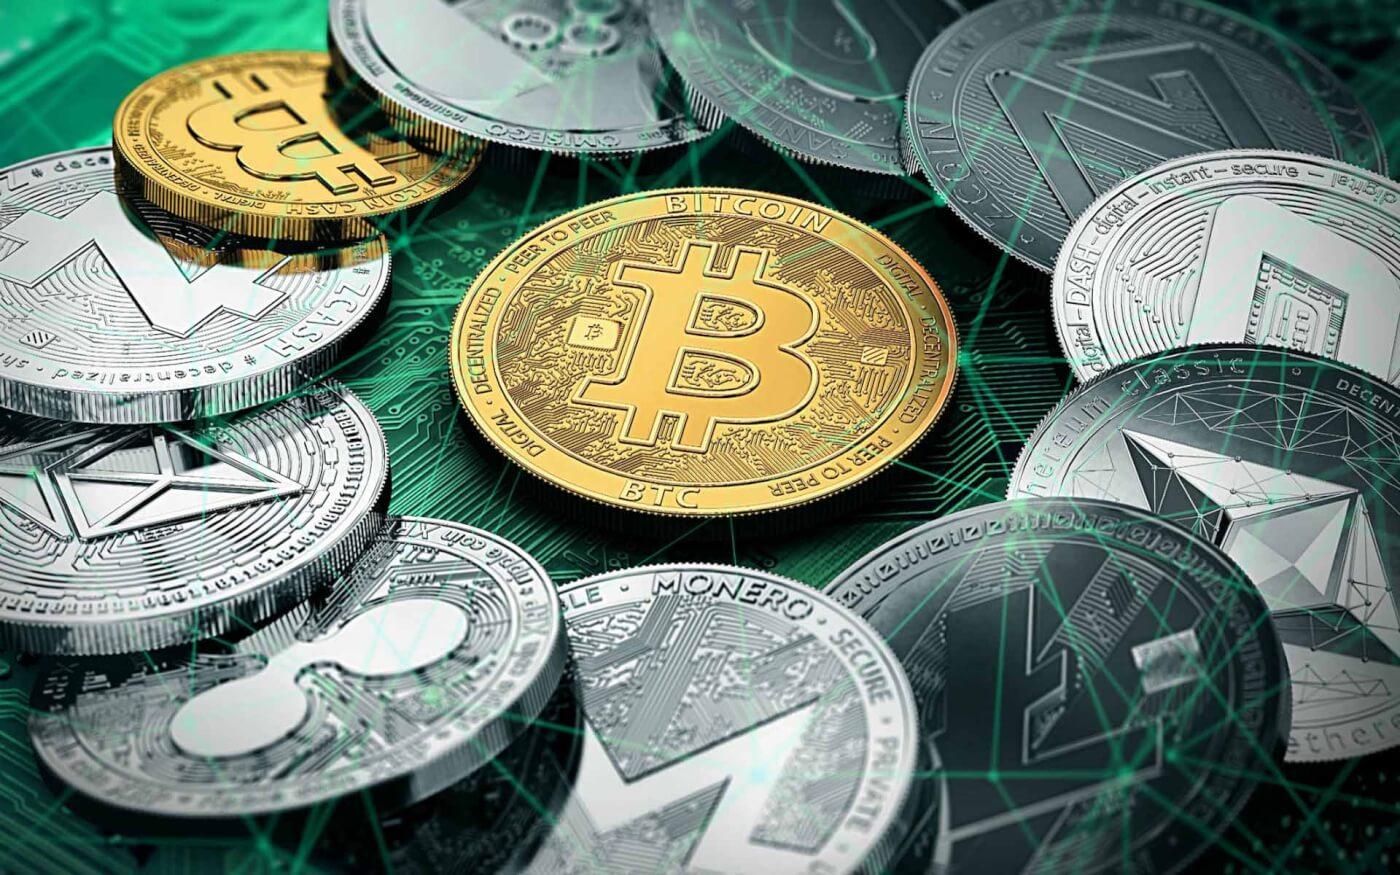 las 10 principales compañías de inversión en bitcoins comercio de criptomonedas malasia